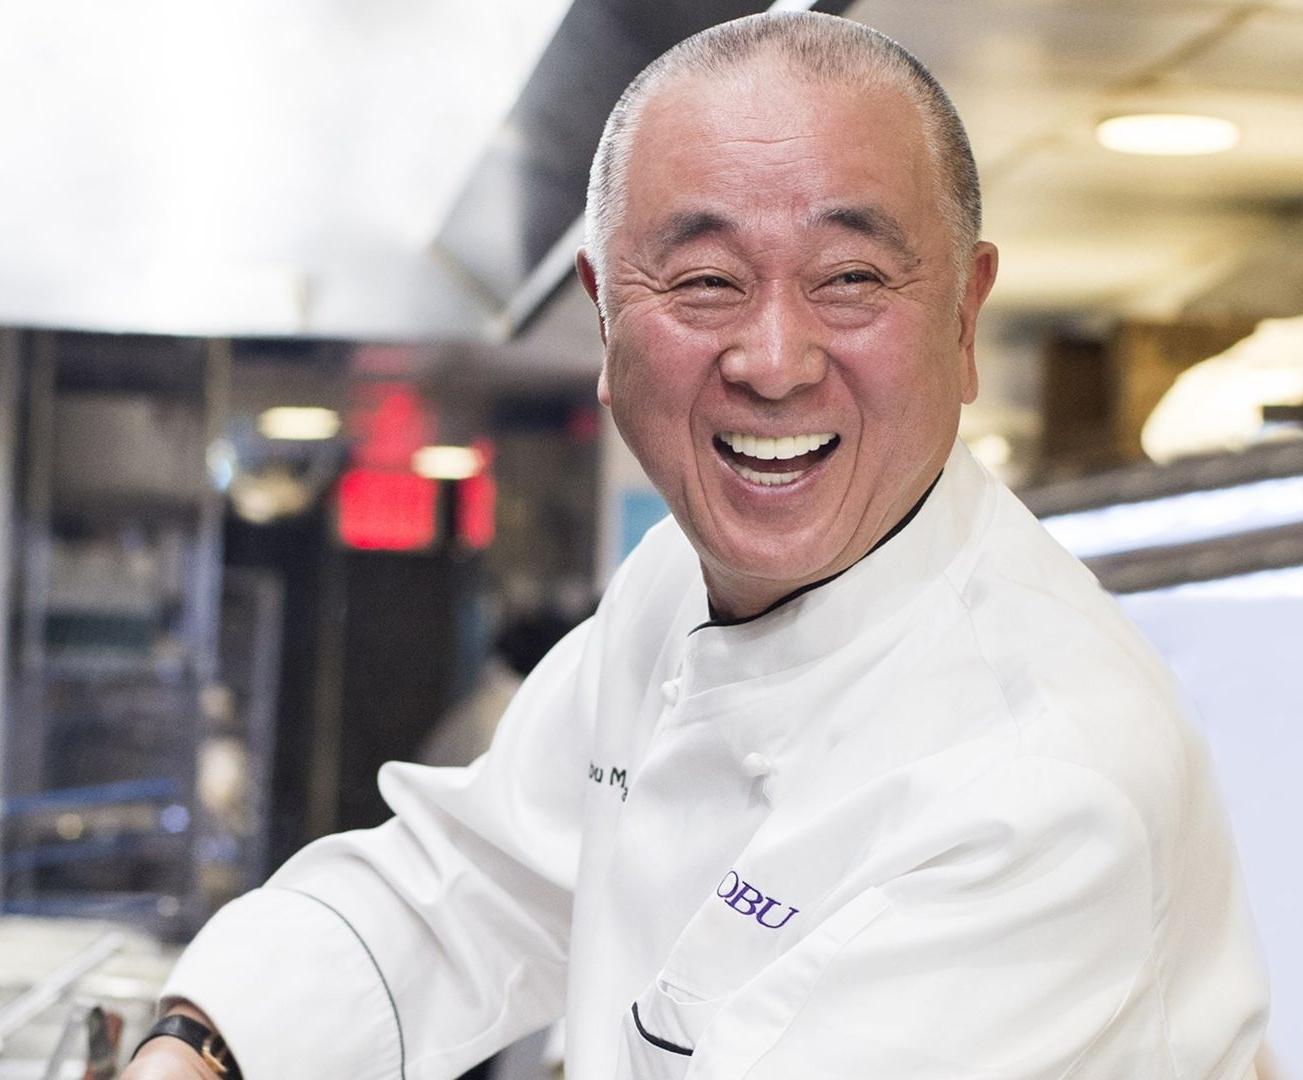 Chef-Nobu-Matsuhisa-conde-nast-traveller-15sept17-Evan-Sung.jpg